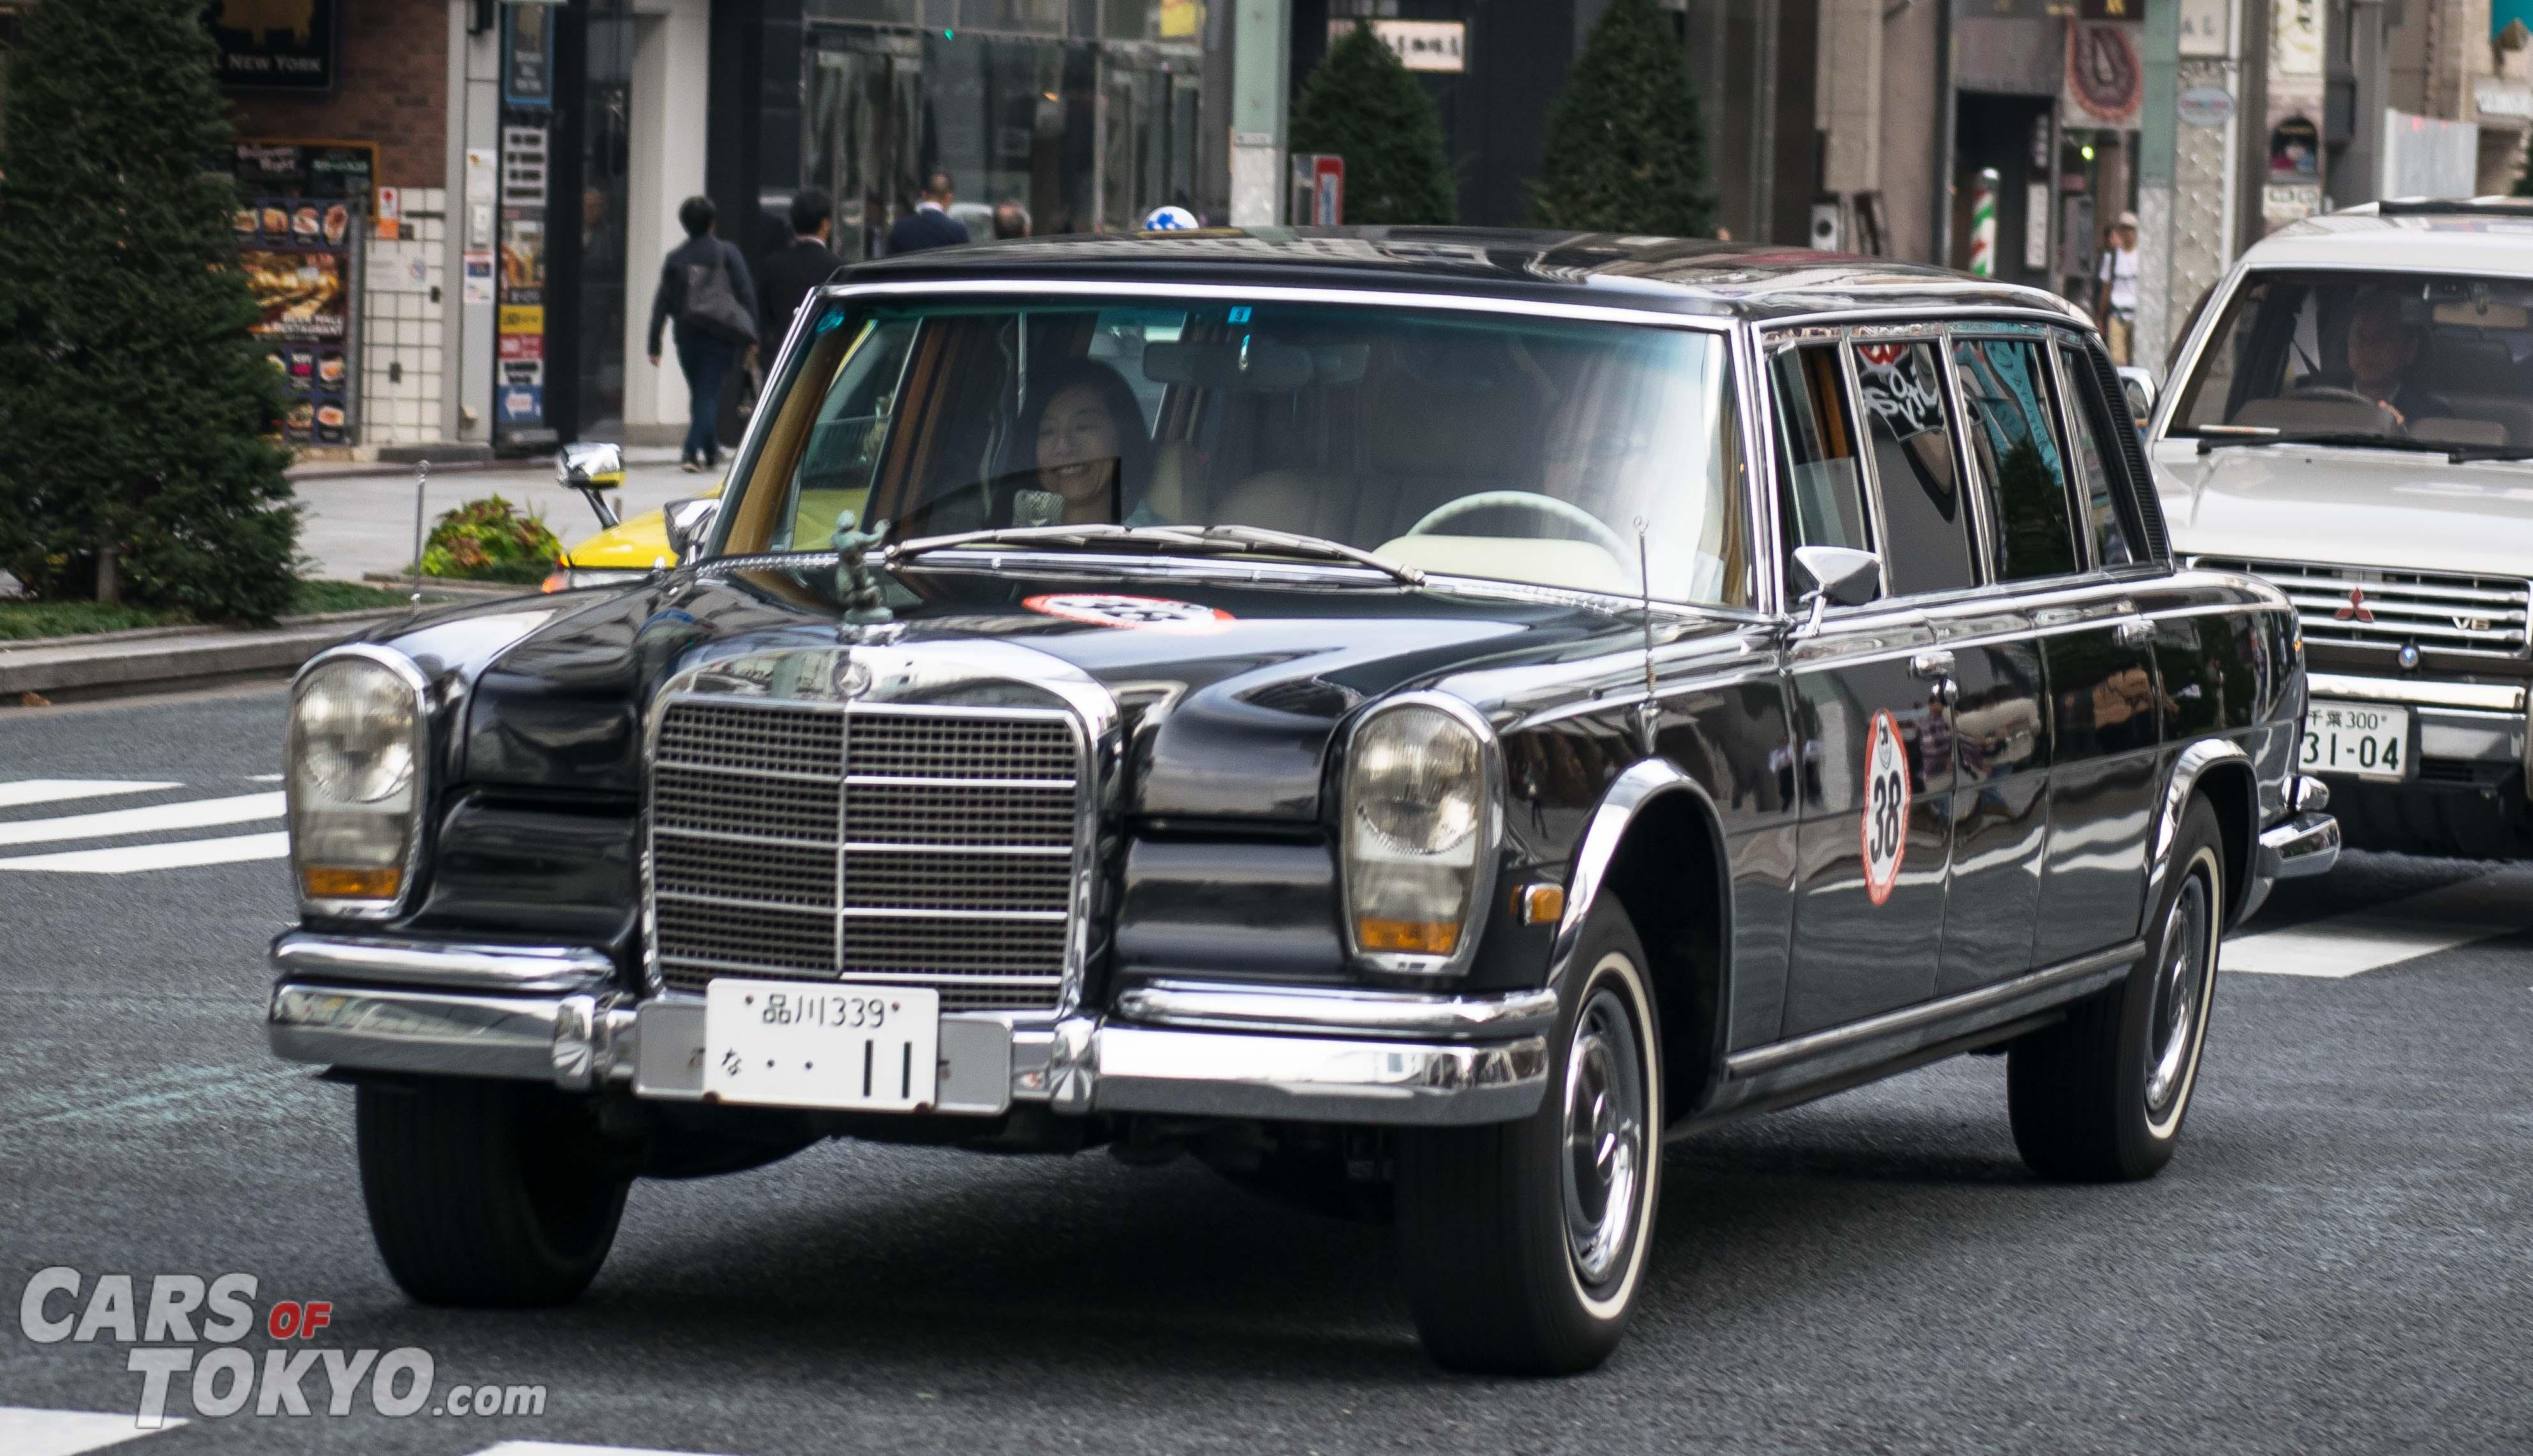 Cars of Tokyo Classic Mercedes Benz 600 Pullman